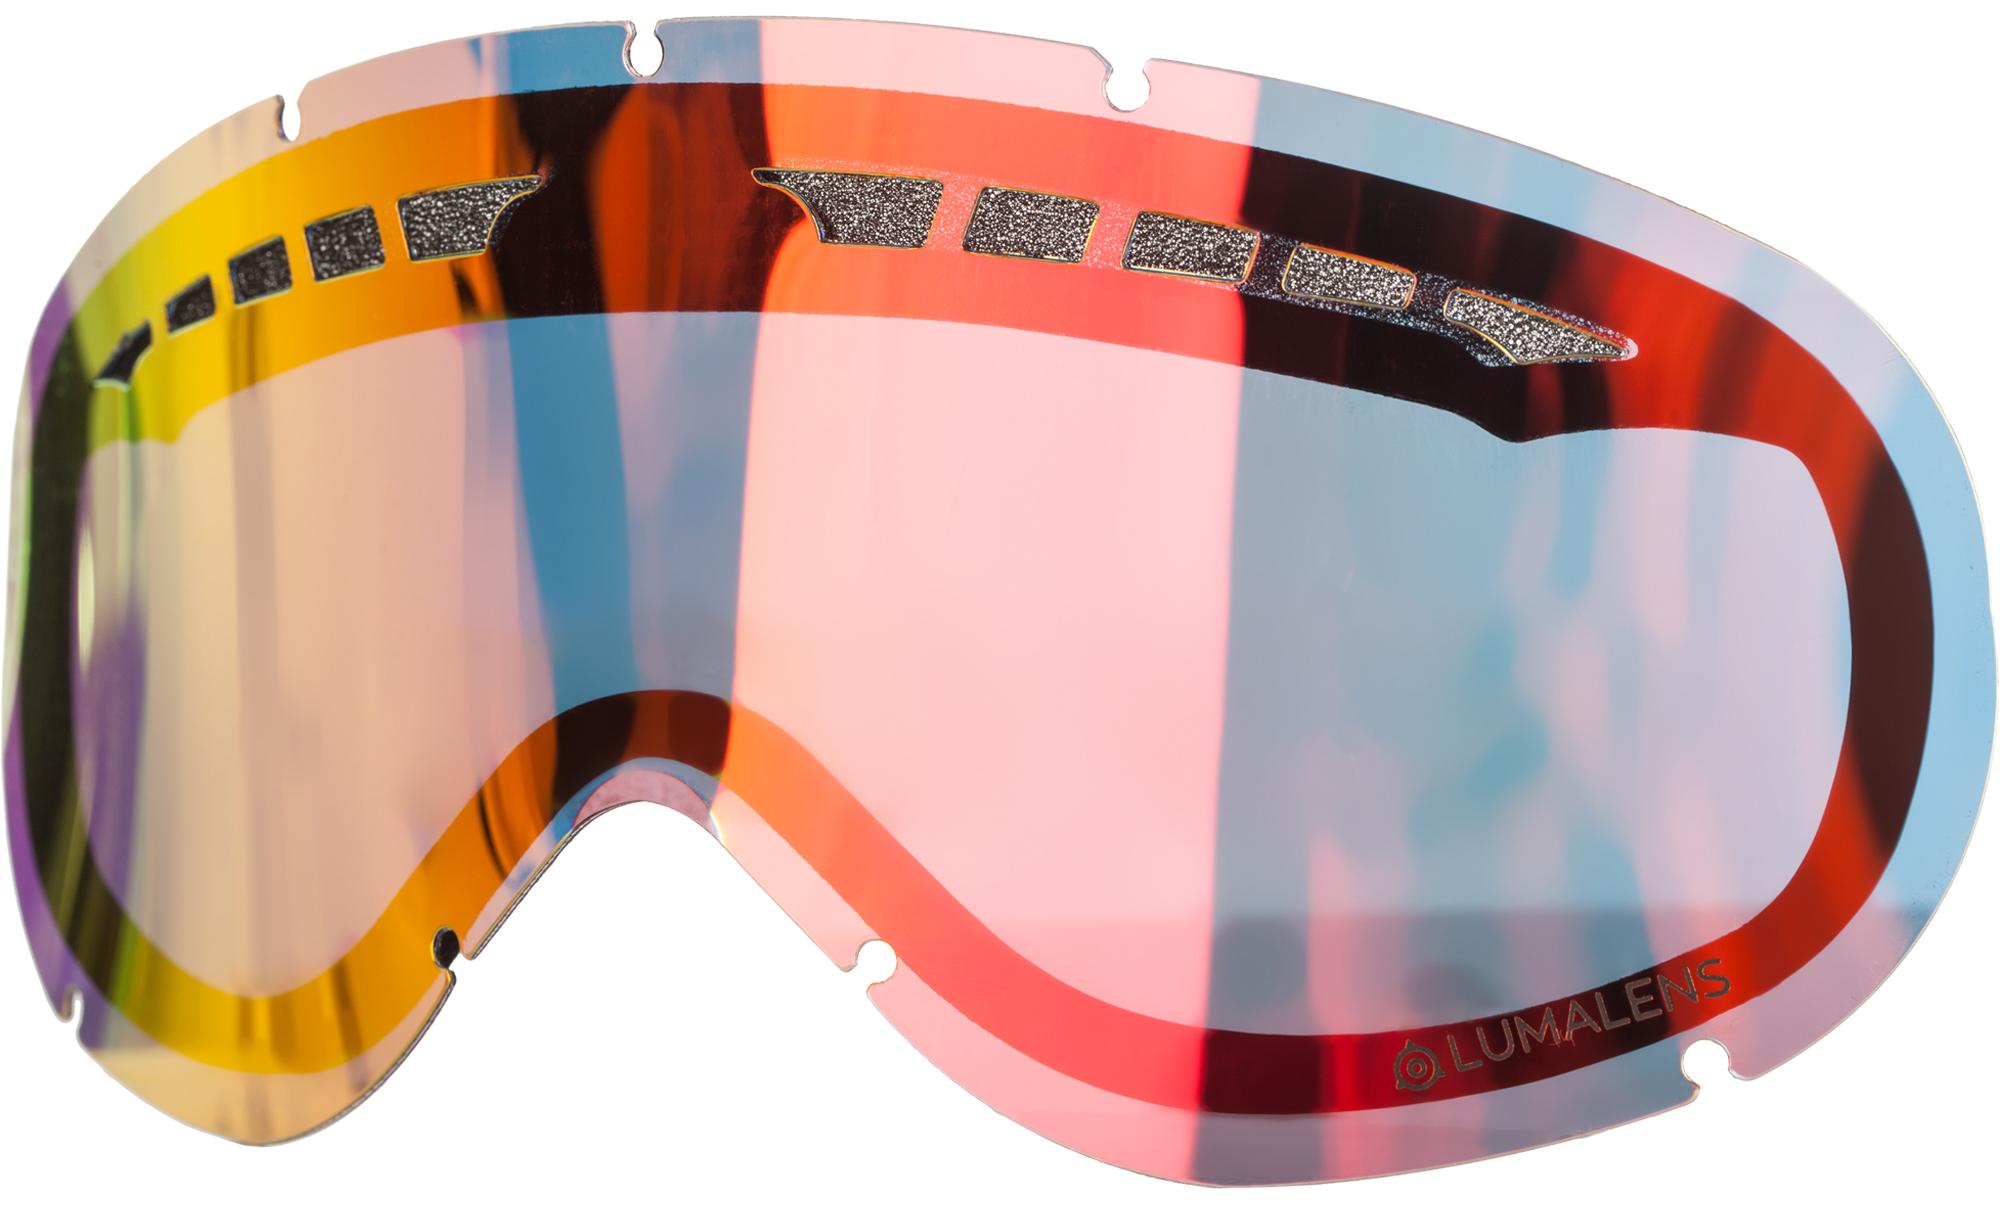 Dragon Линза для маски Dragon DX RPL LENS - Lumalens Red Ion маска для сноуборда dragon nfxs plot pink ion yellow